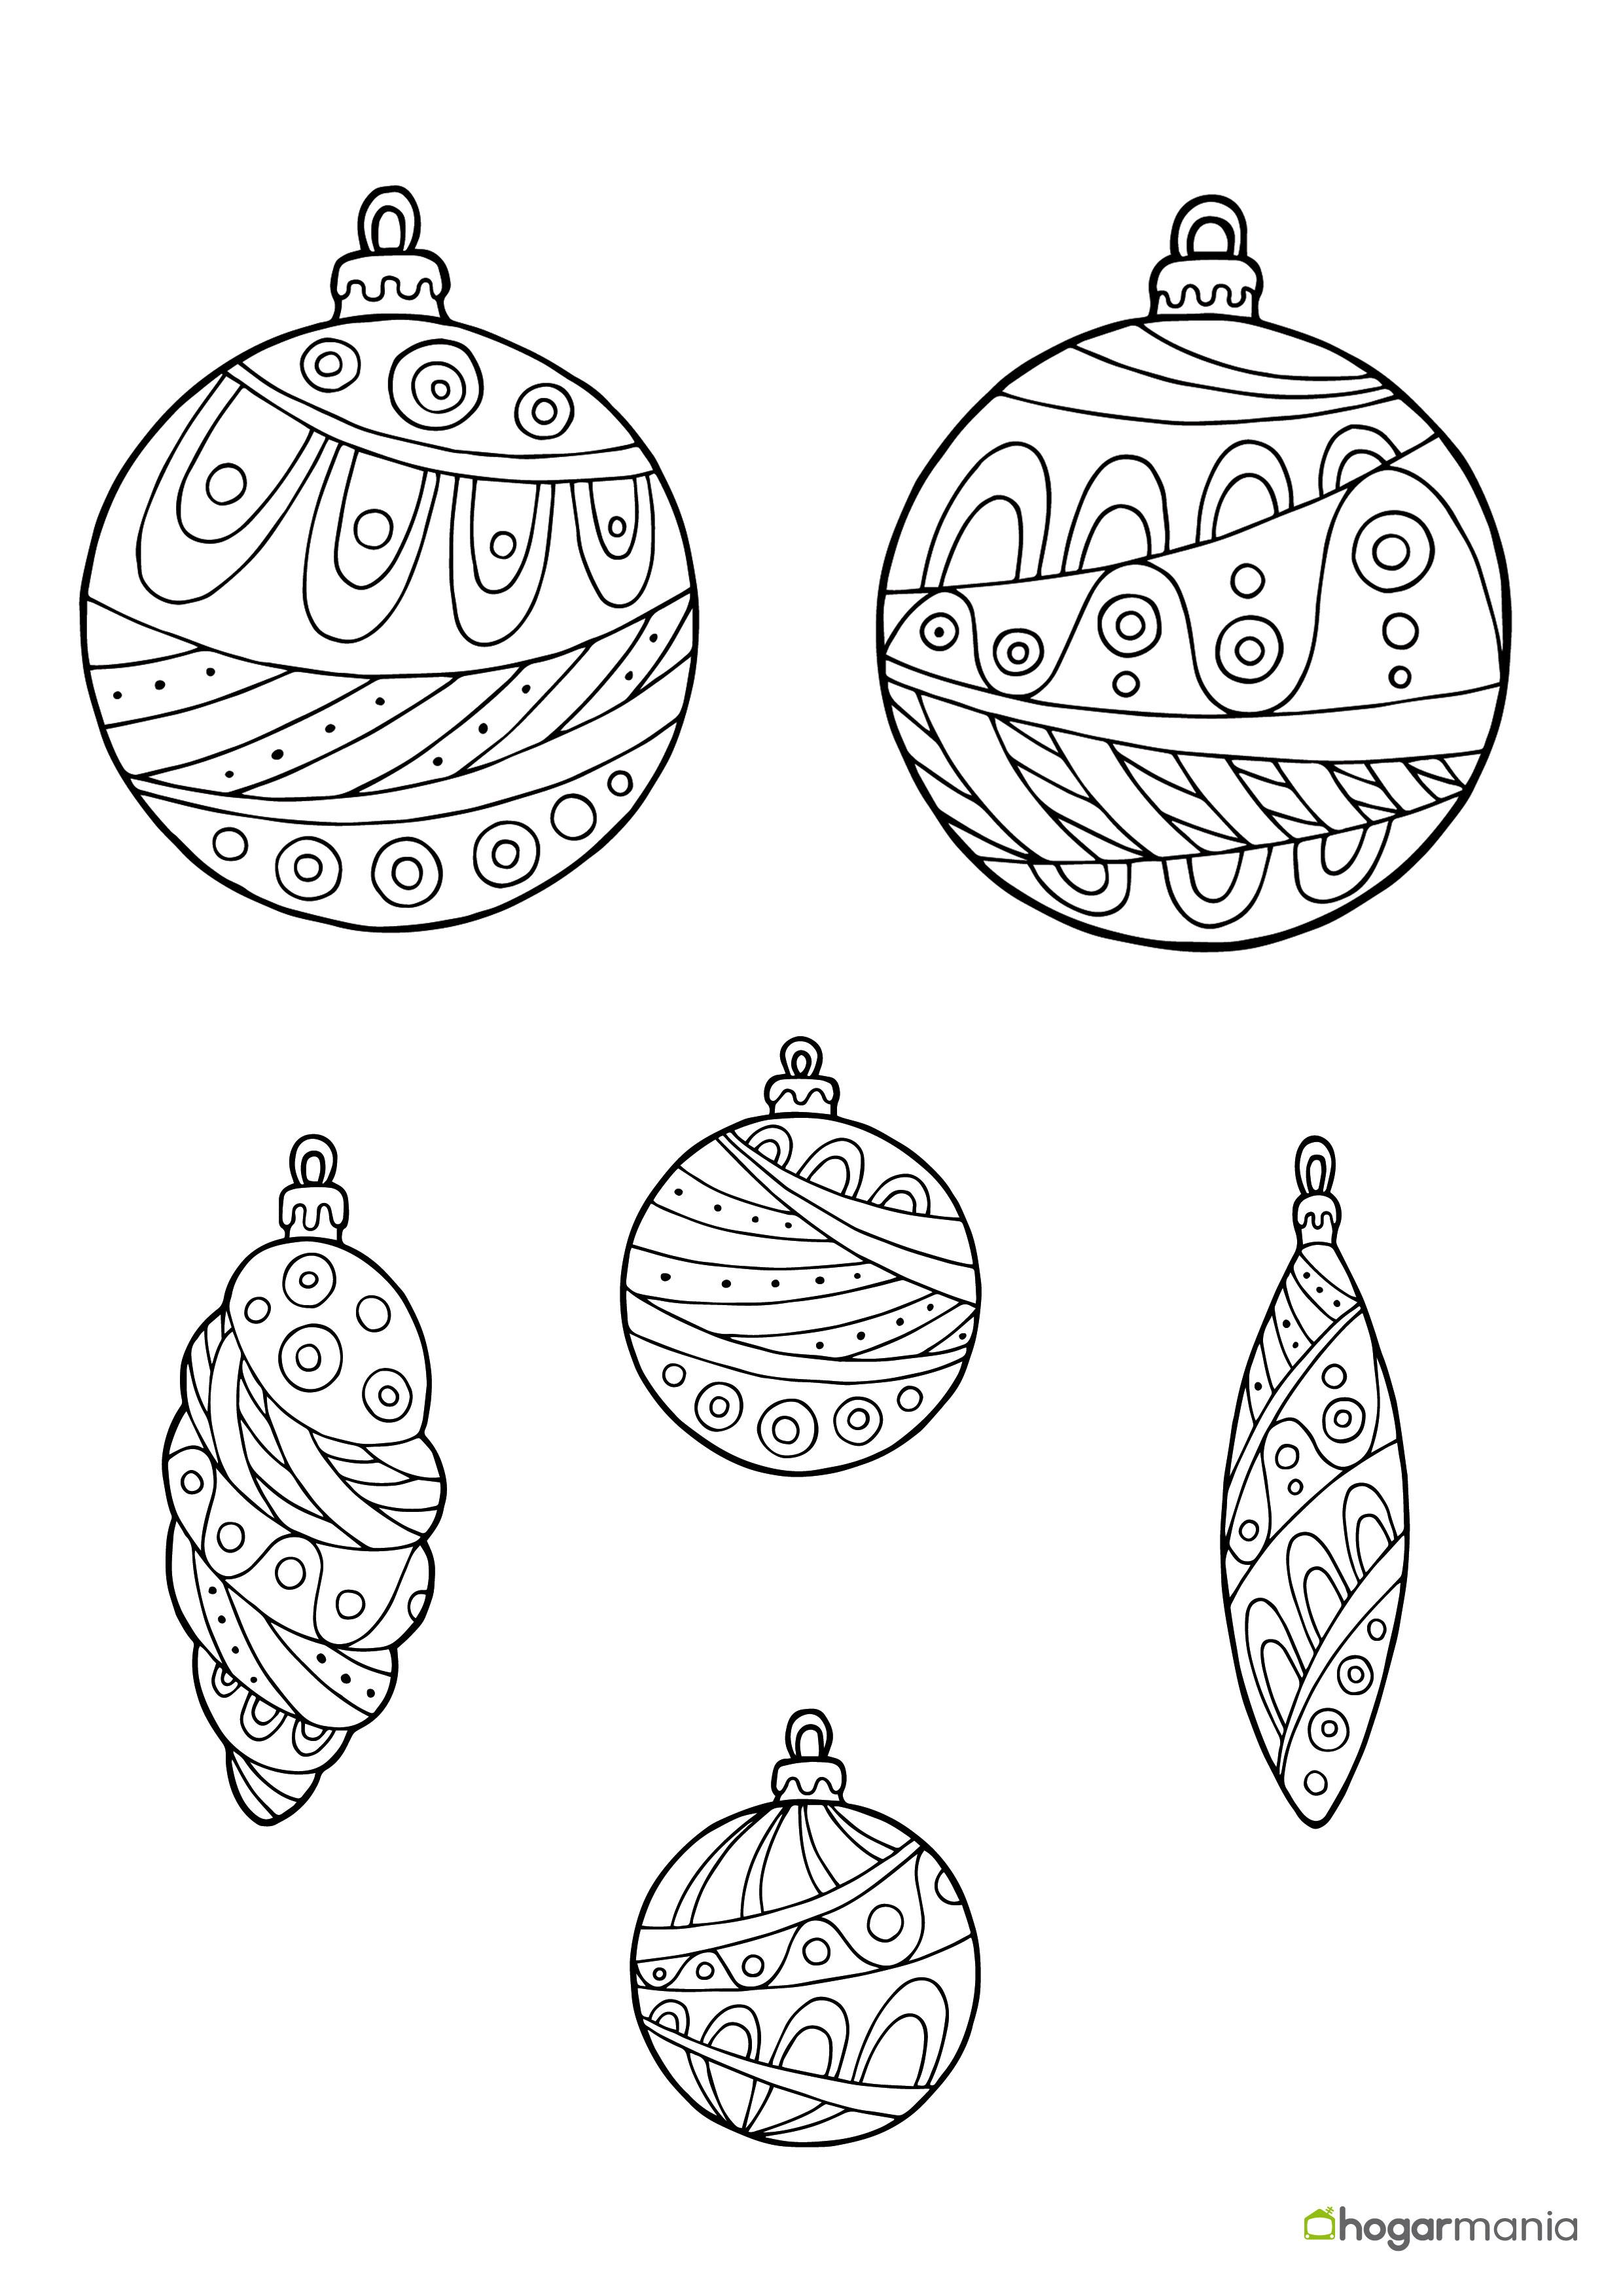 Inspirador Dibujos De Bolas De Navidad Para Colorear E Imprimir